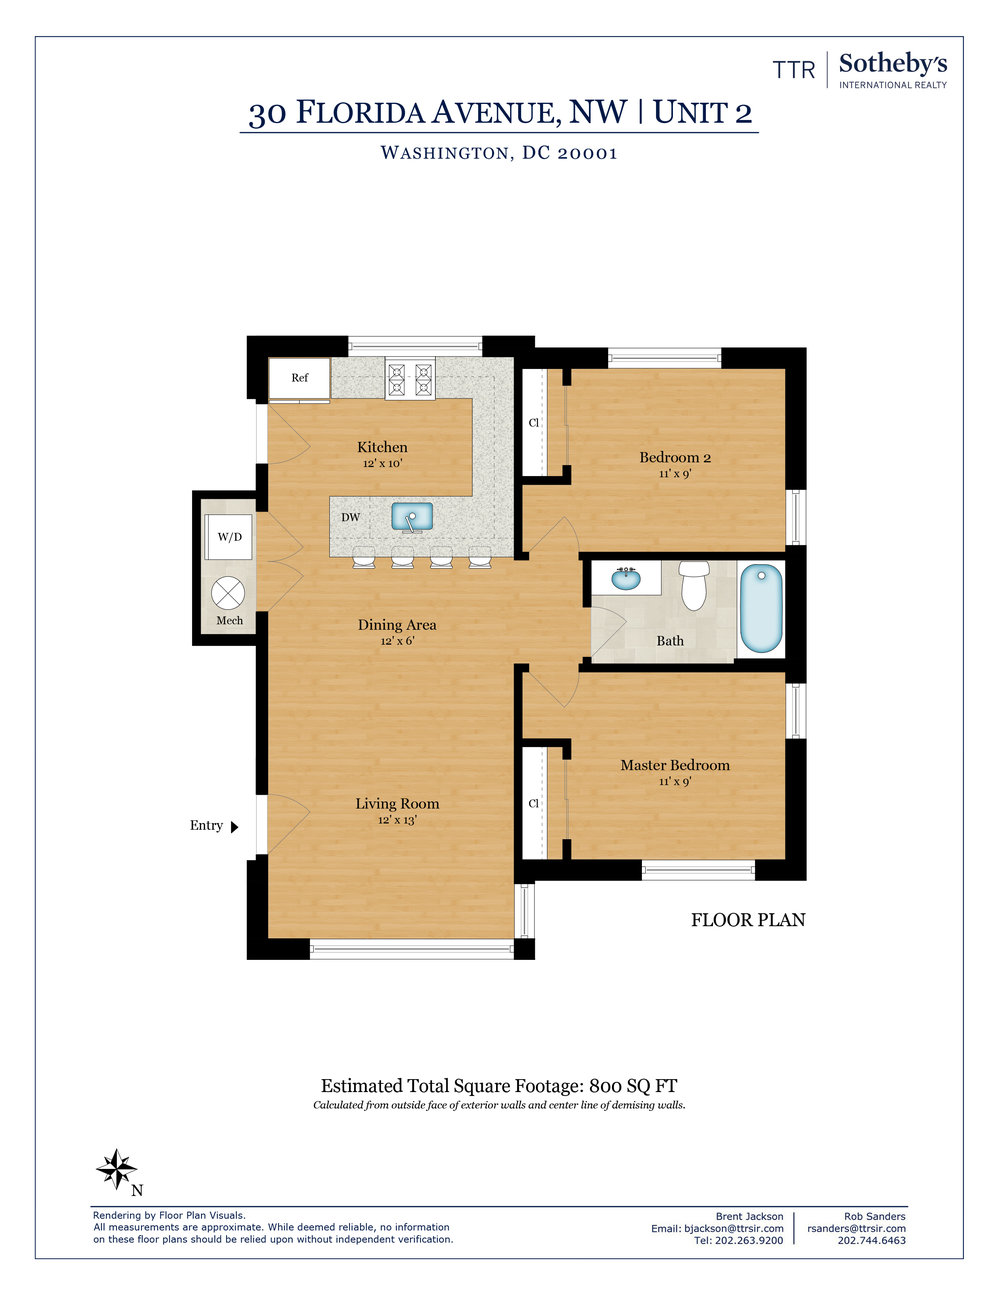 BJ-30FloridaAveNW#2-FloorPlan-Print-R1.jpg